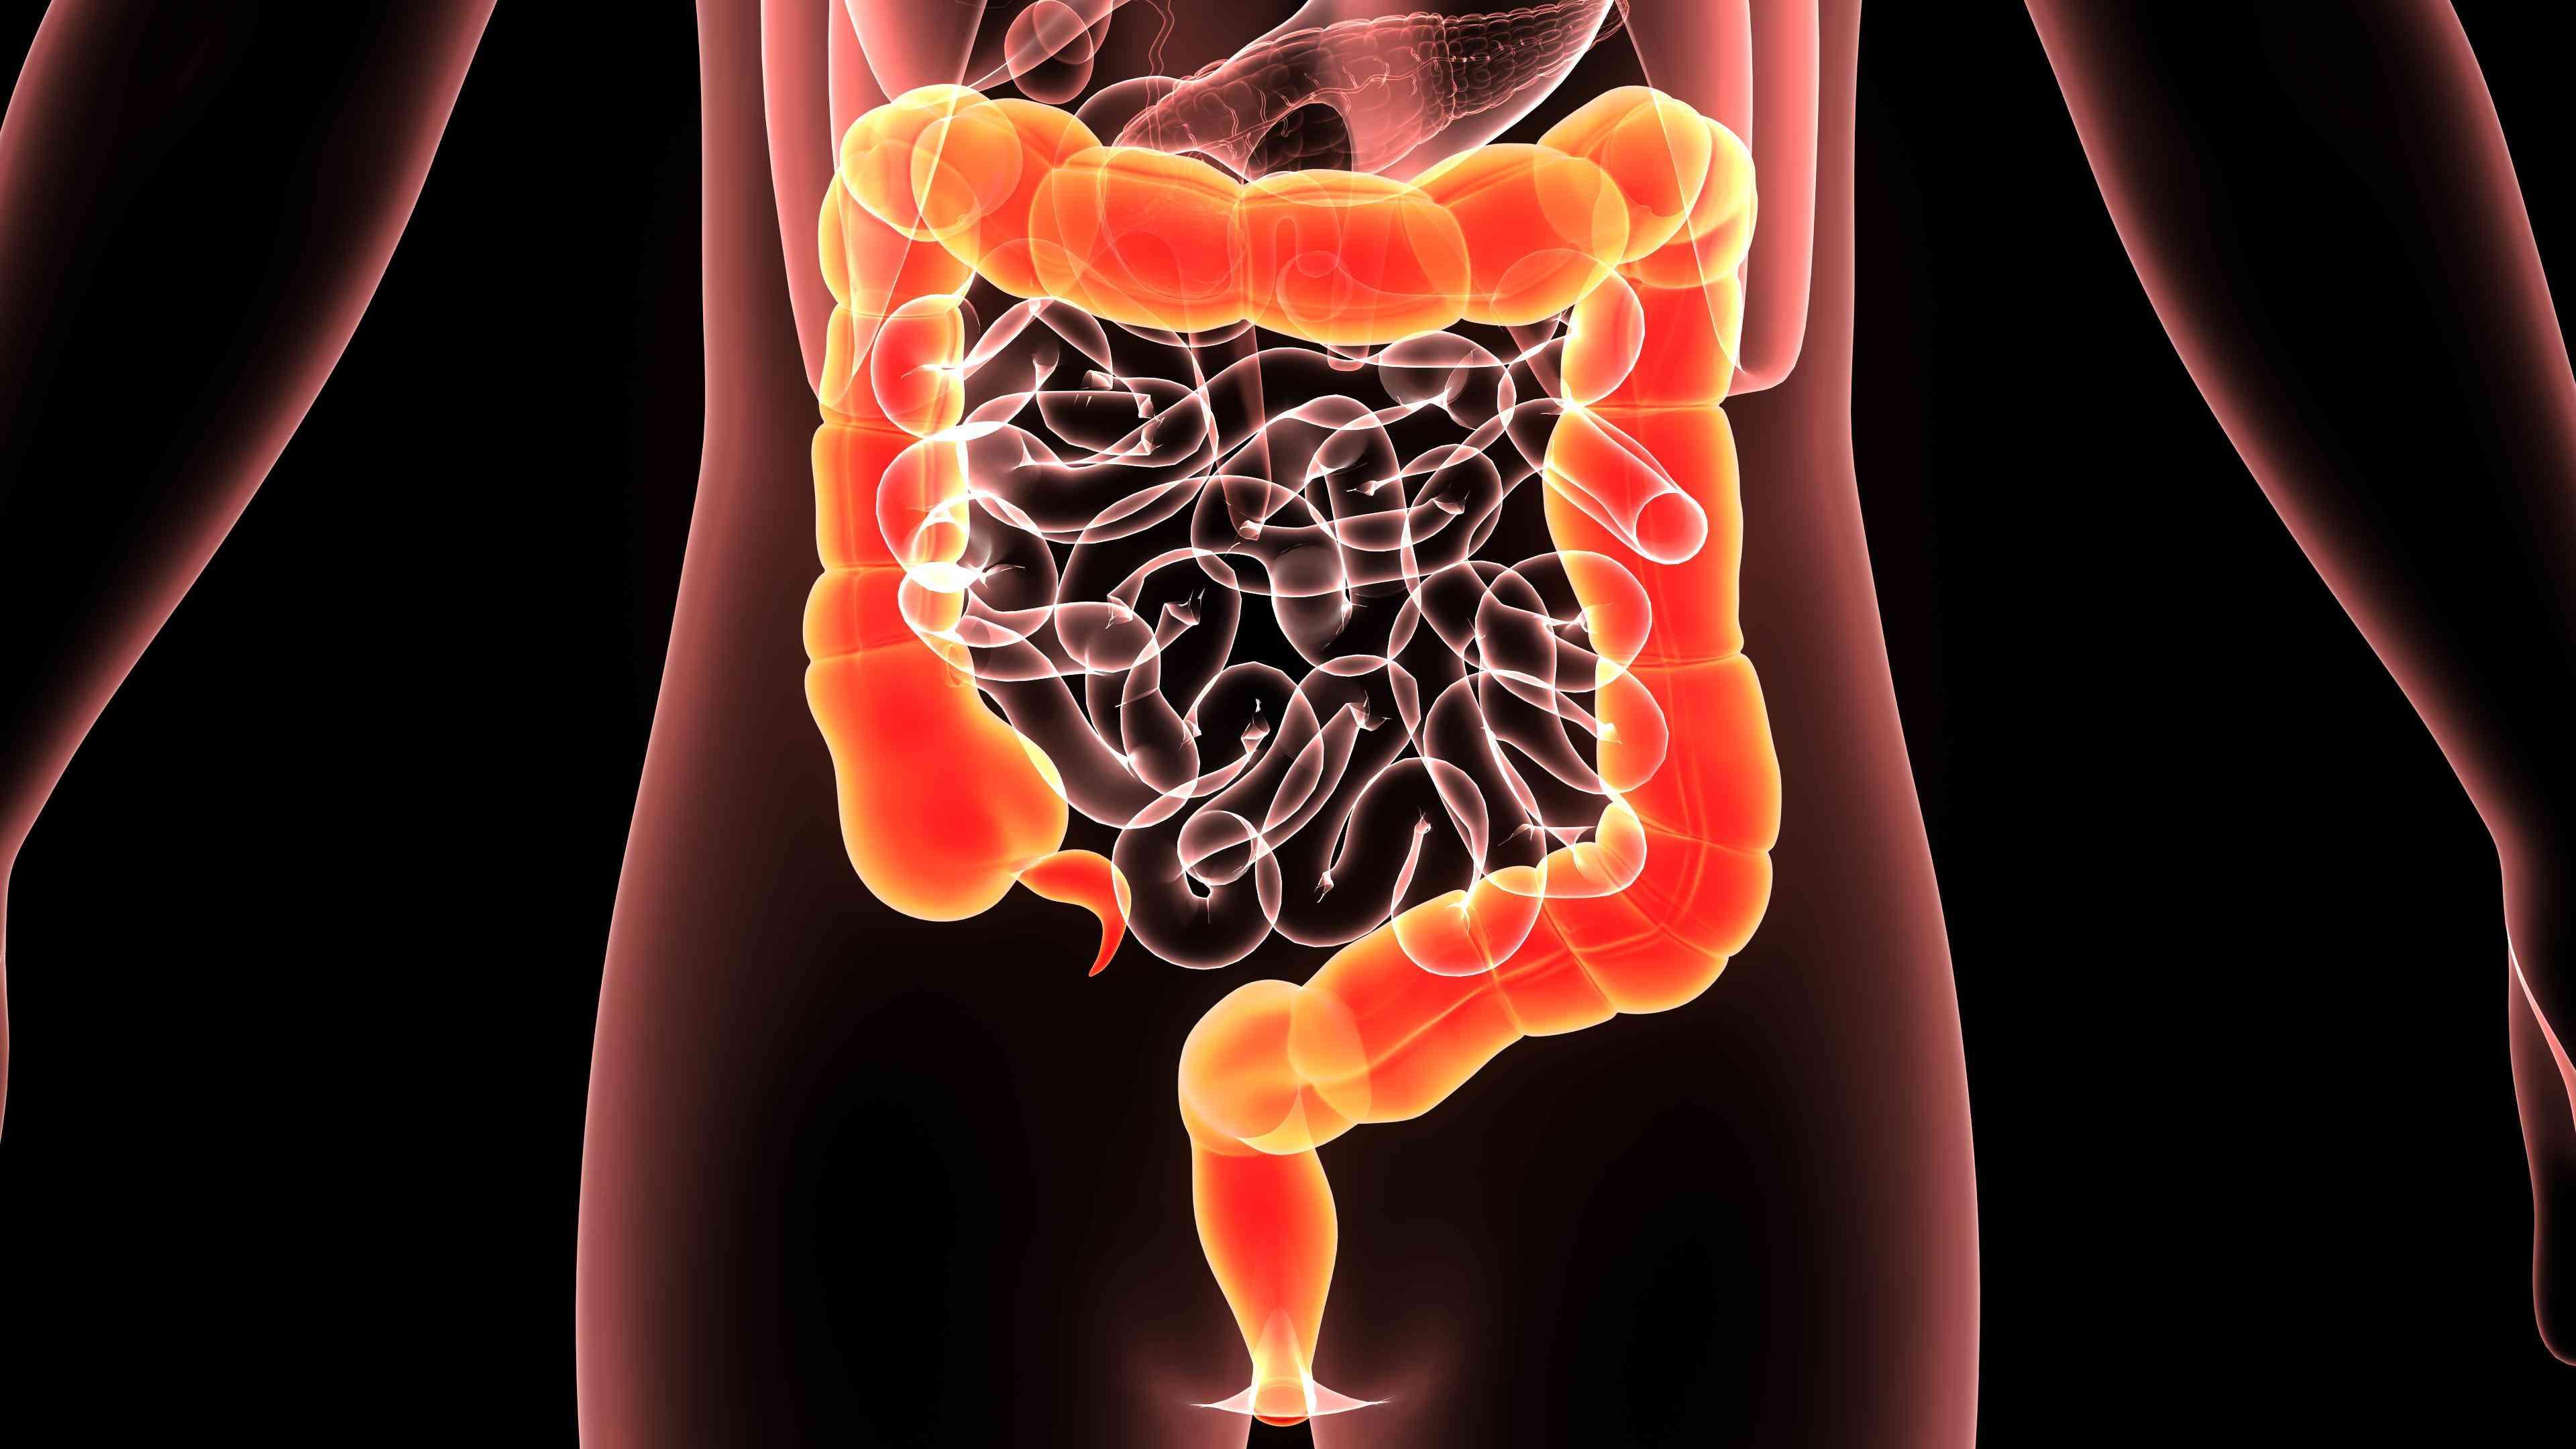 Diagram of a human colon